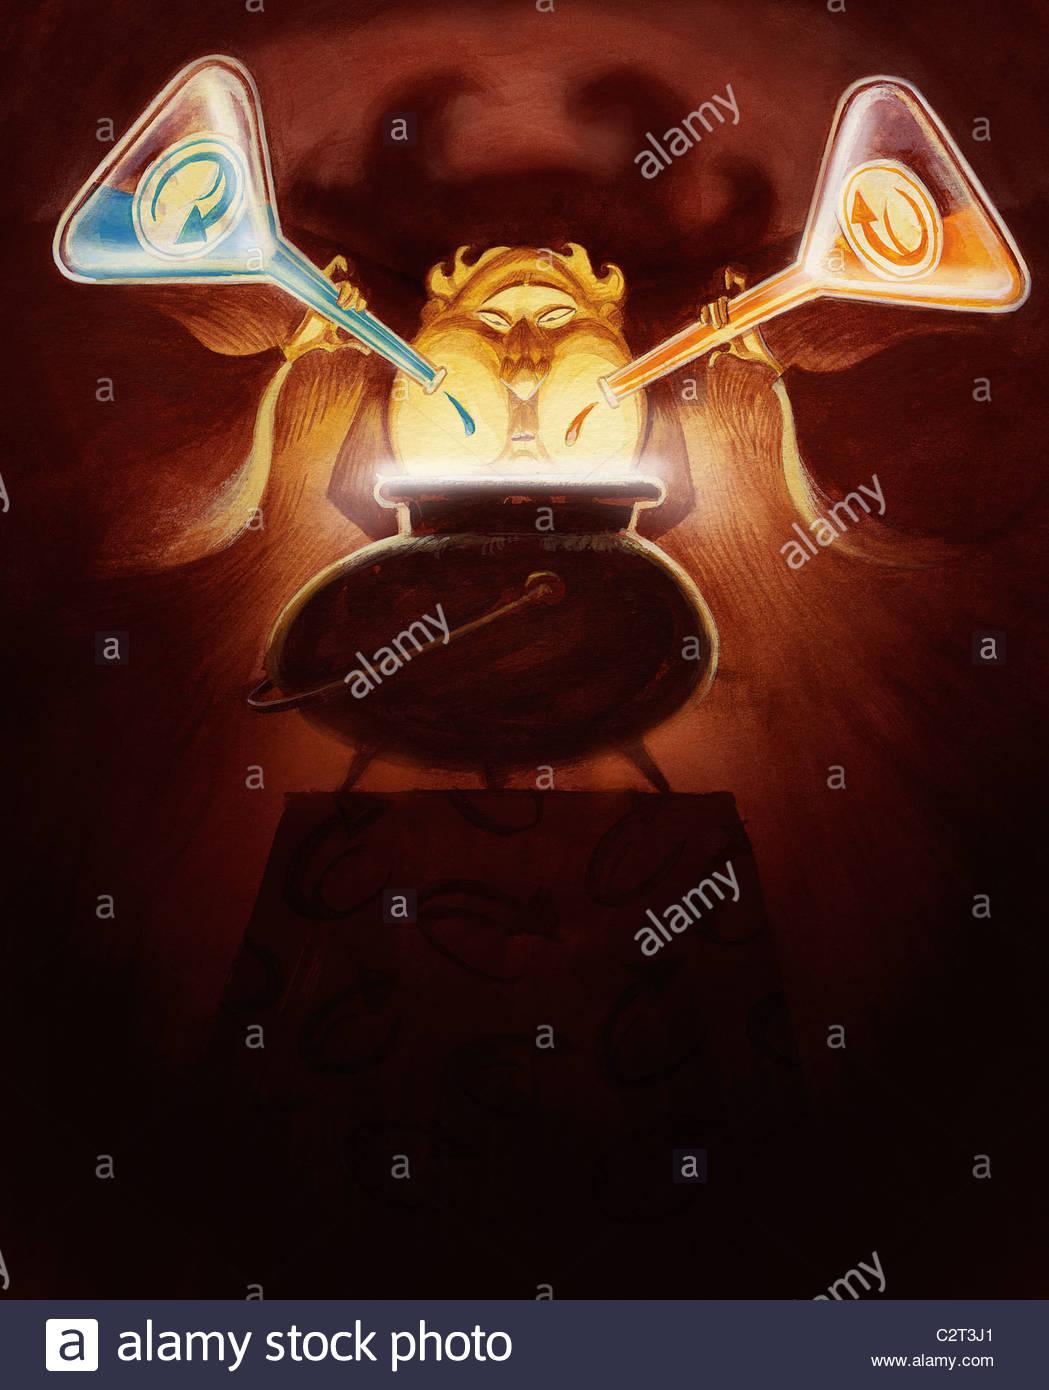 Man pouring liquid into cauldron - Stock Image